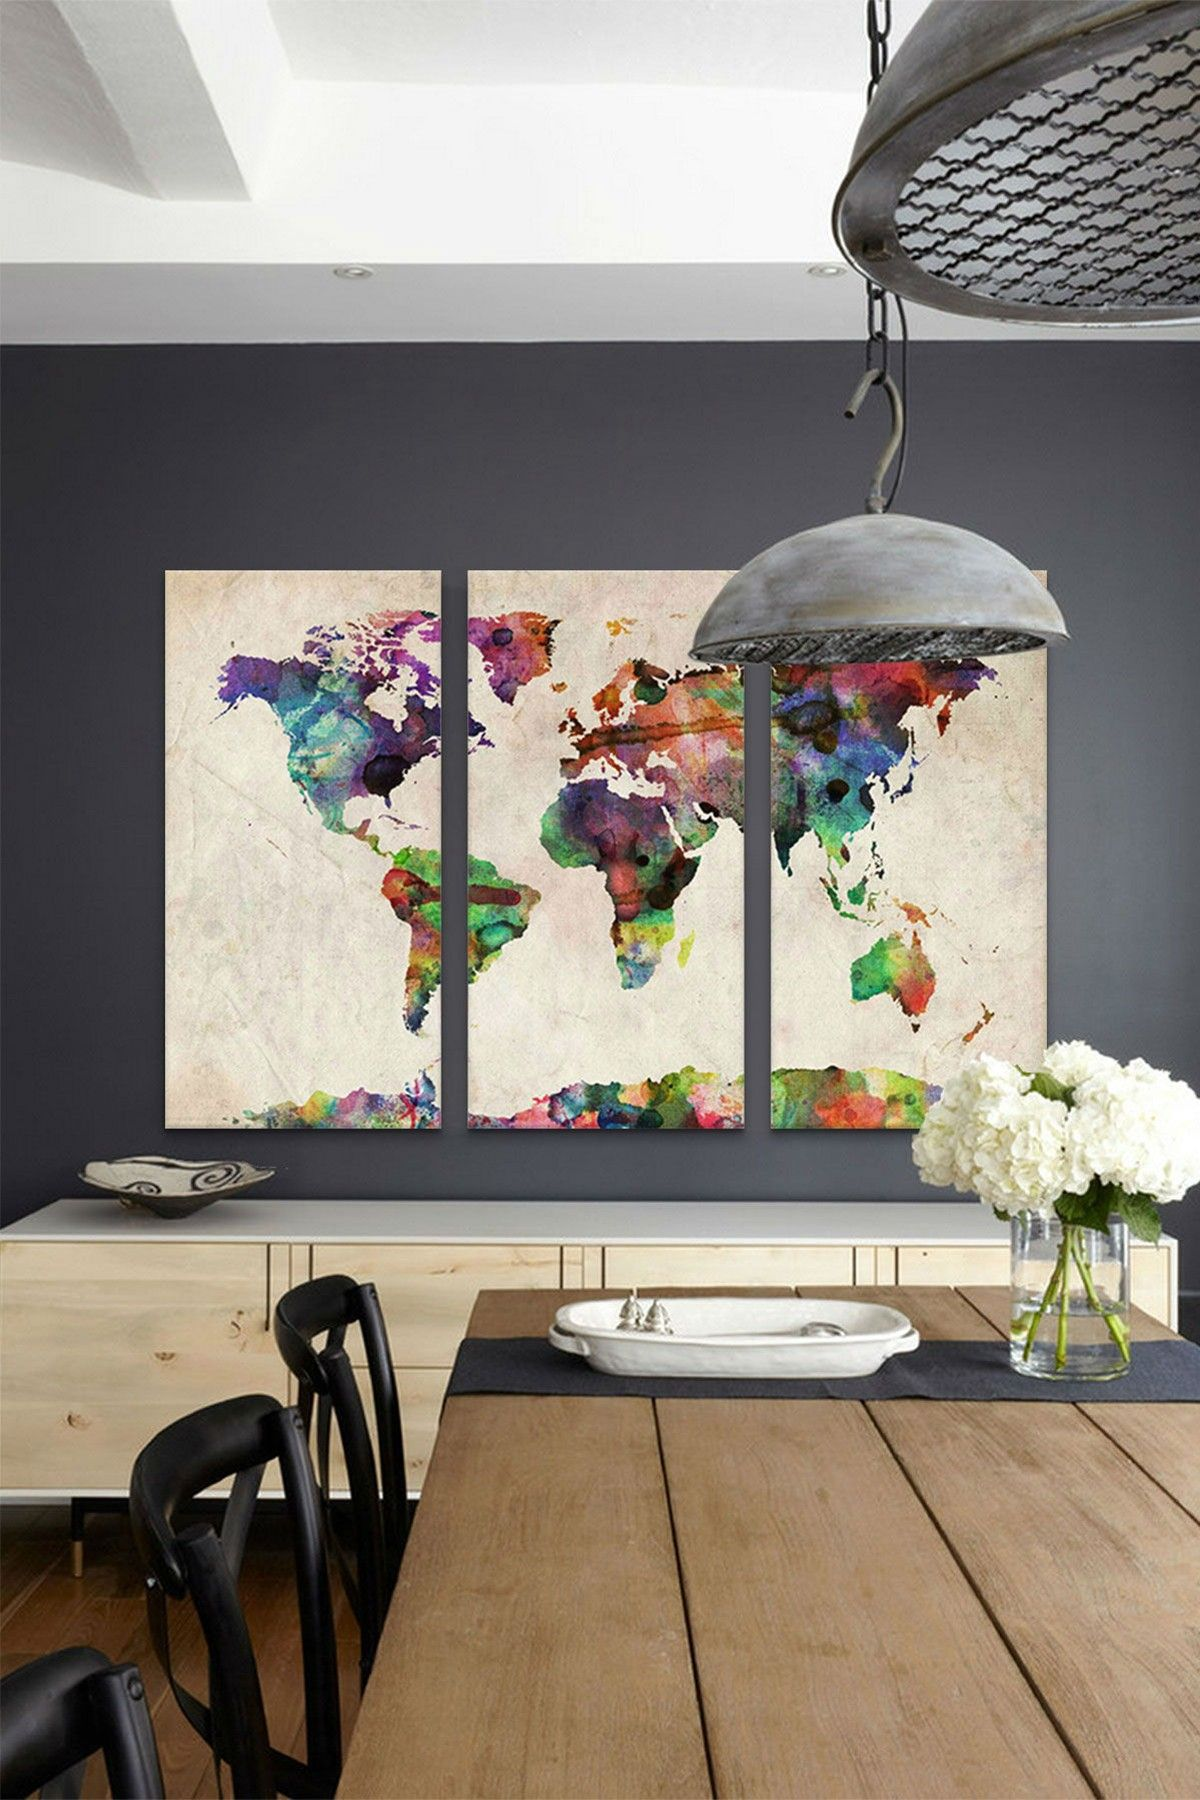 Deco Murale Mappemonde concernant world map urban watercolor ii 3 panel sectional wall art on